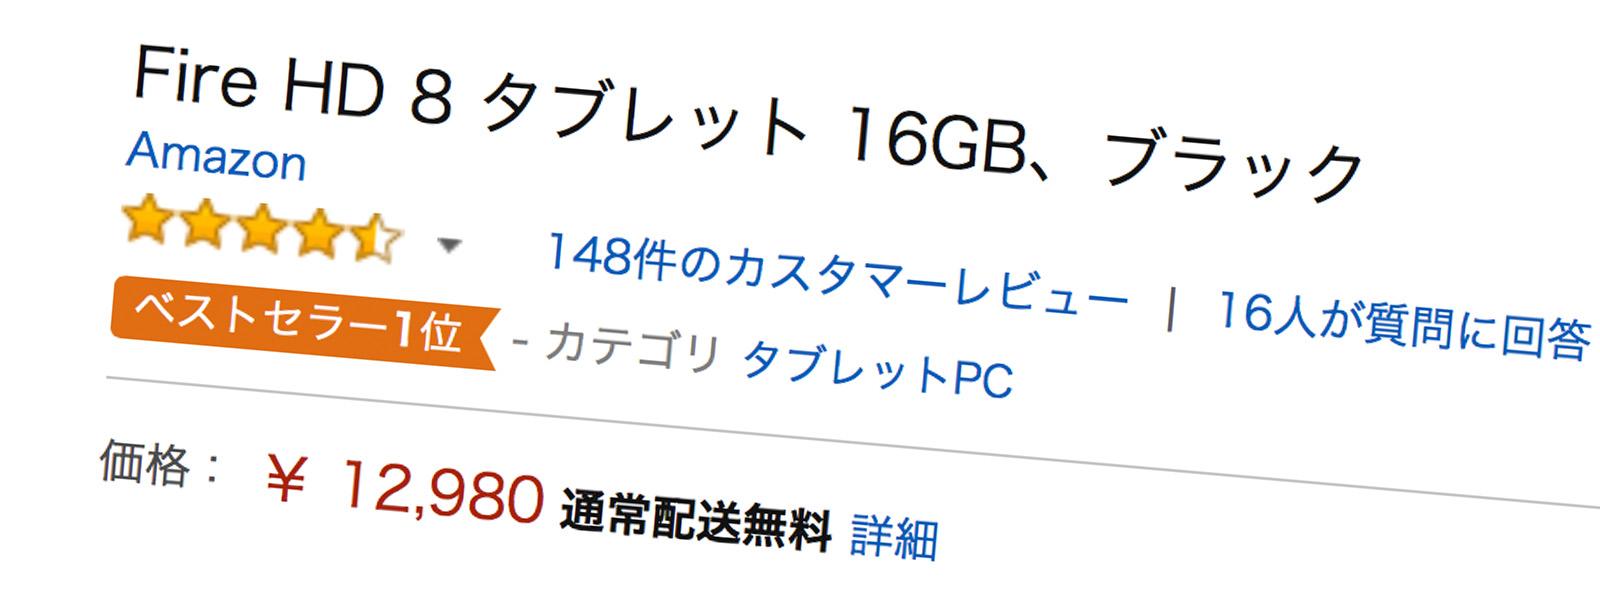 Fire HD 8 安い